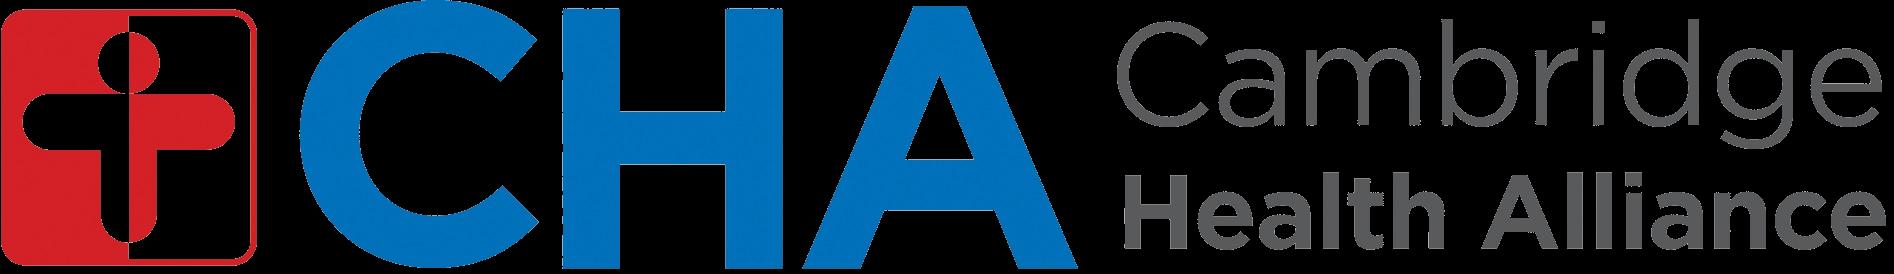 CHA logo transparent.png